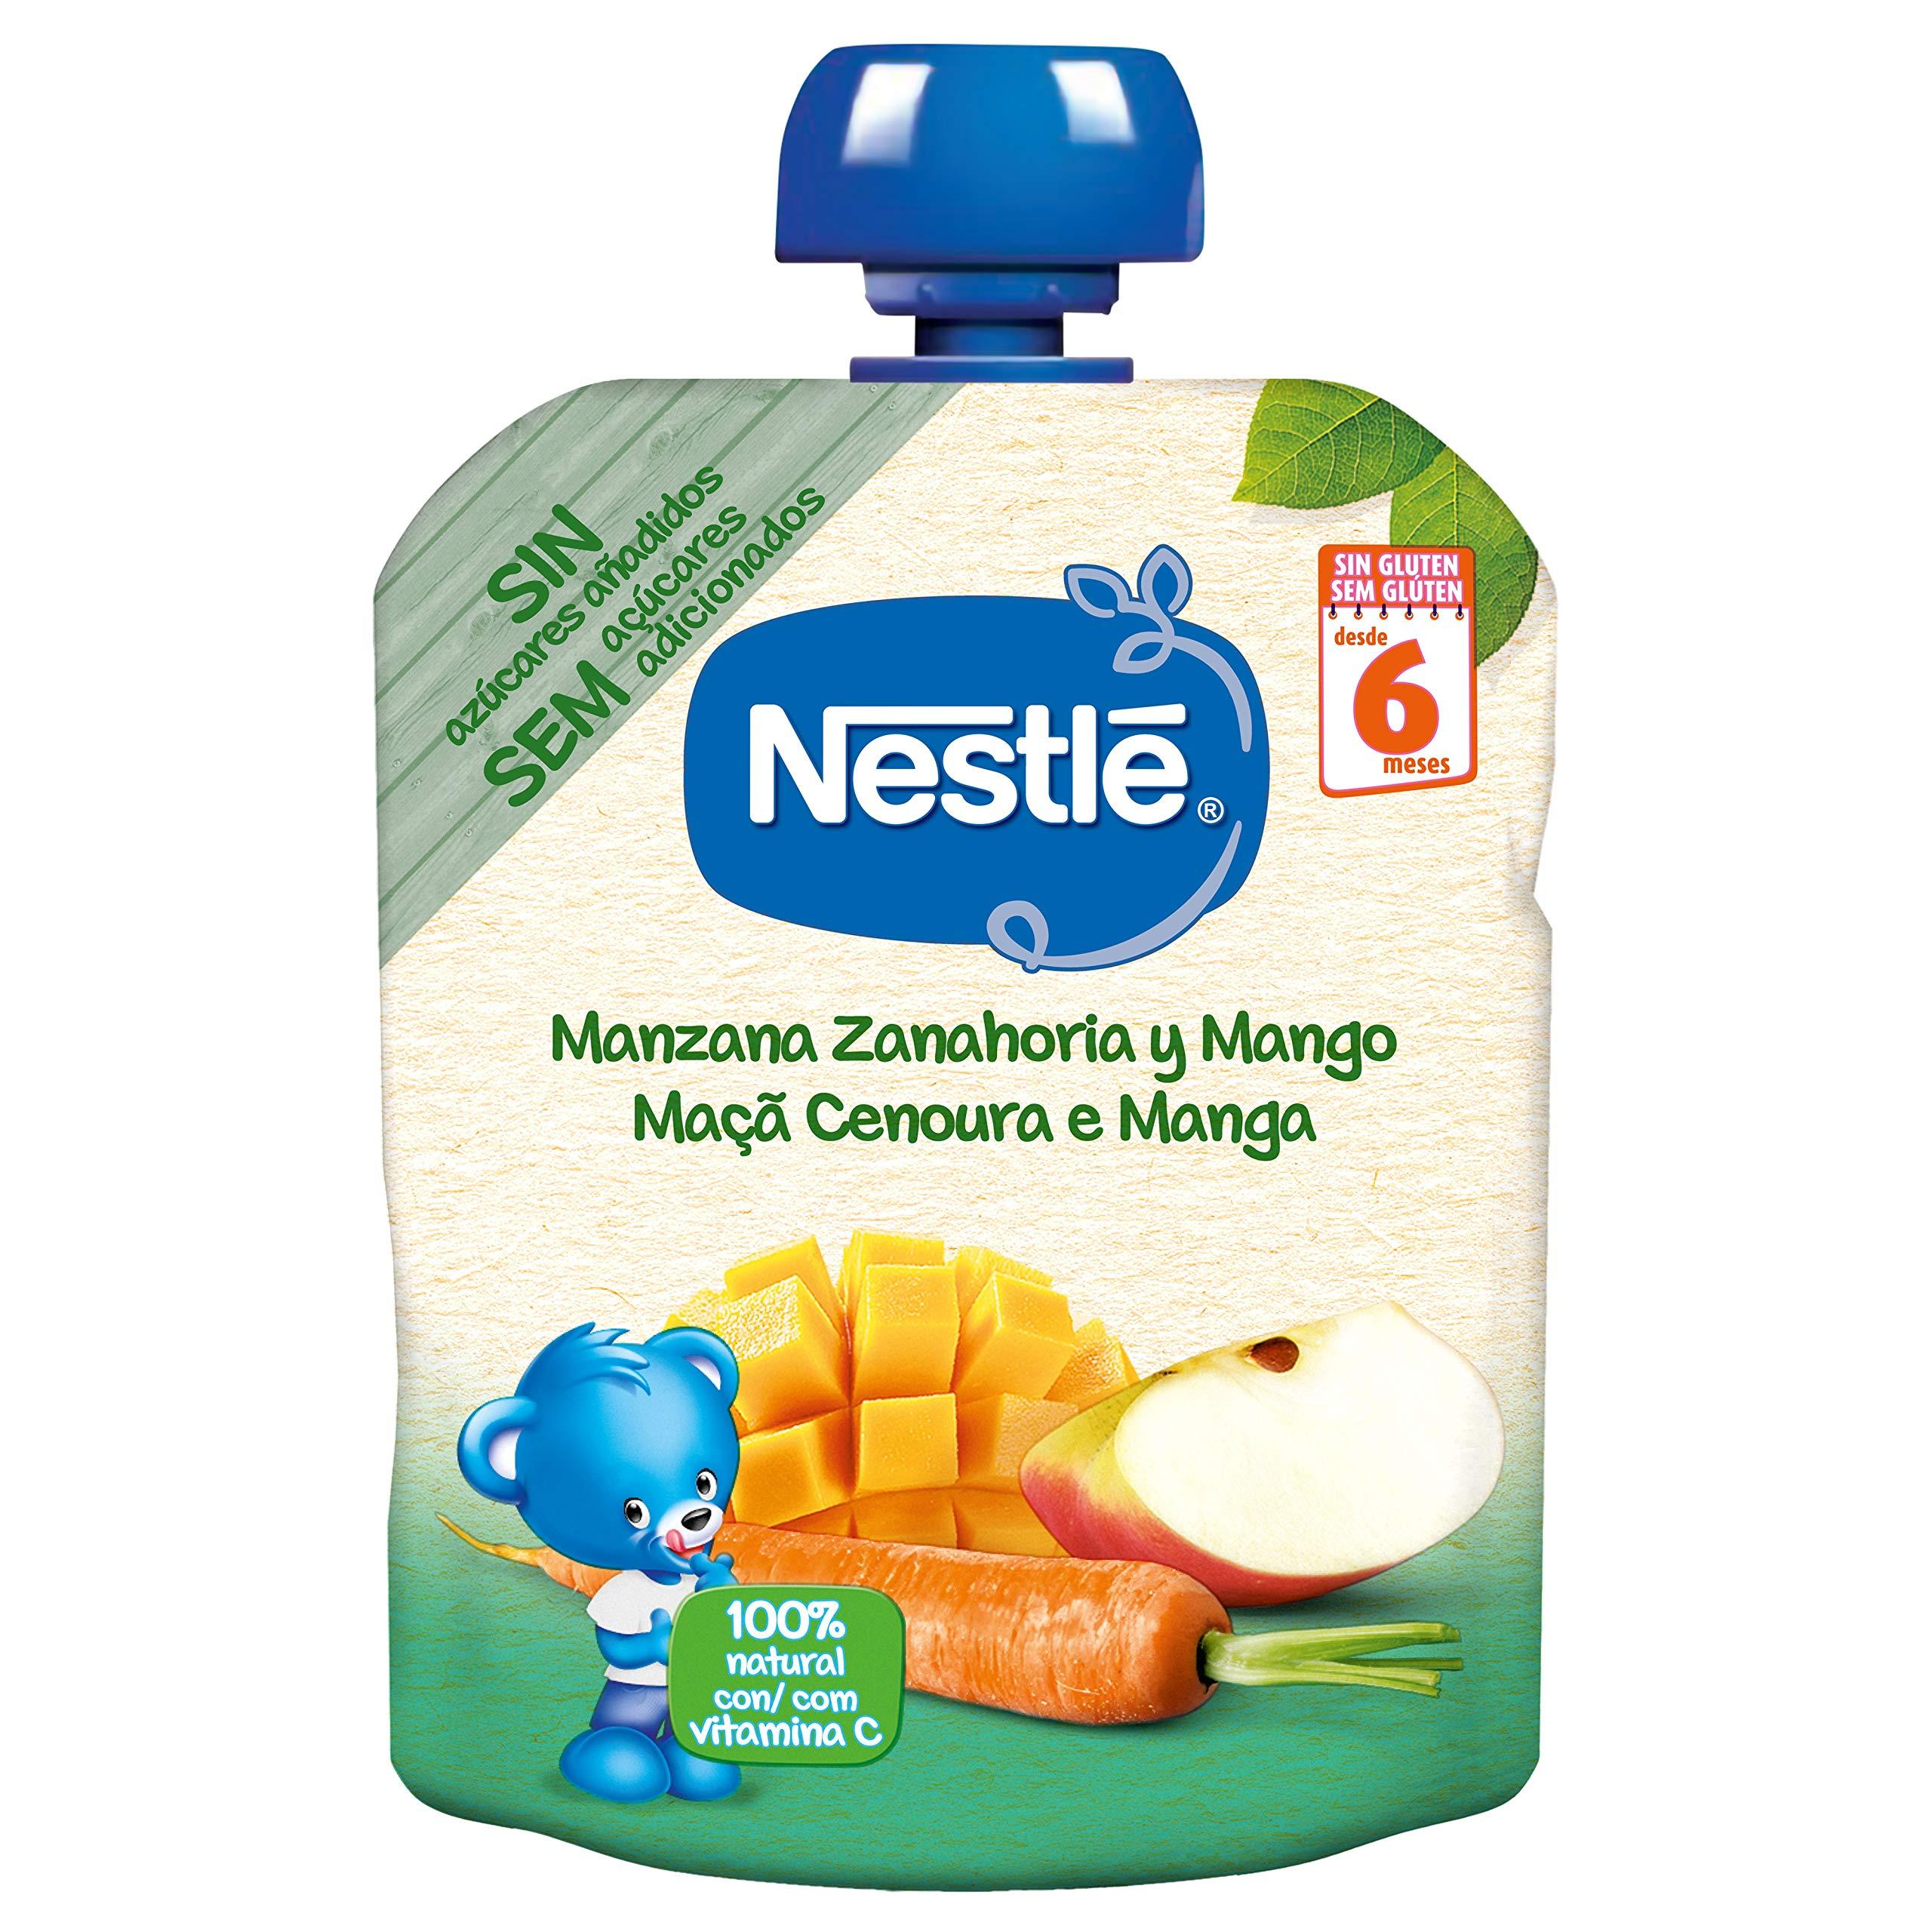 Nestlé Bolsita de puré de frutas, variedad Manzana Zanahoria y Mango - Para bebés a partir de 6 meses - Paquete de 16 bolsitasx90g